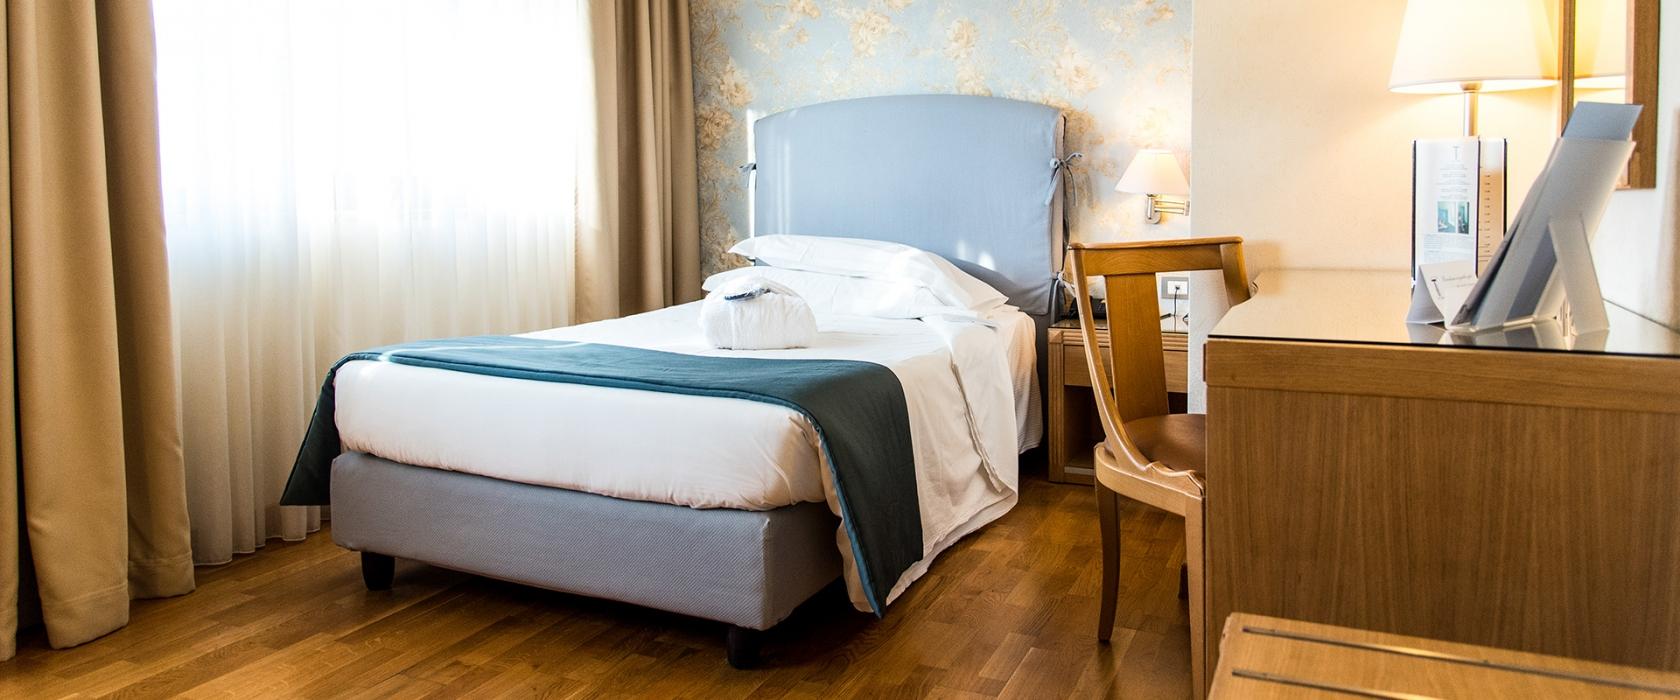 Camera singola ricca di comfort all'Hotel Touring